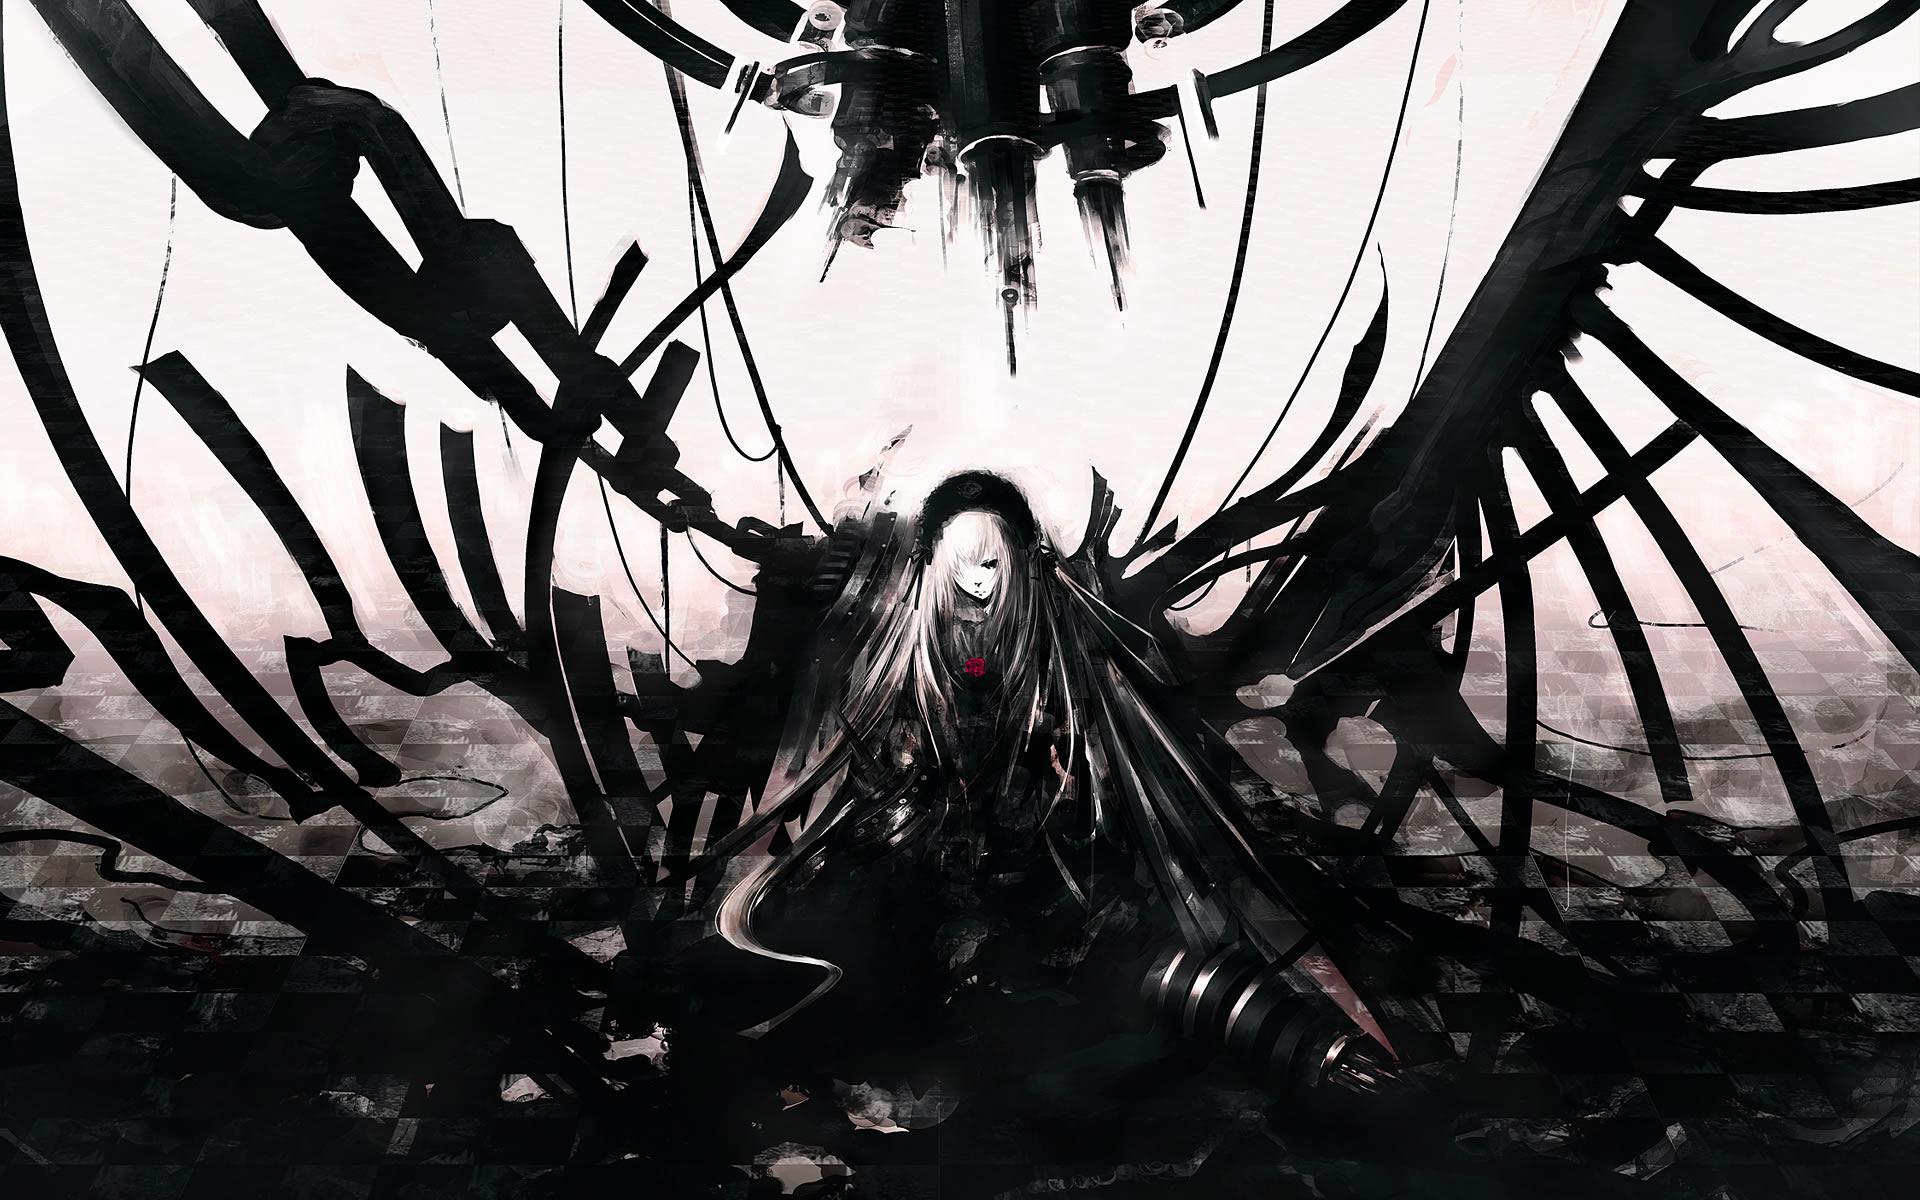 Dark Anime Wallpaper Hd: Hd Wallpapers Anime